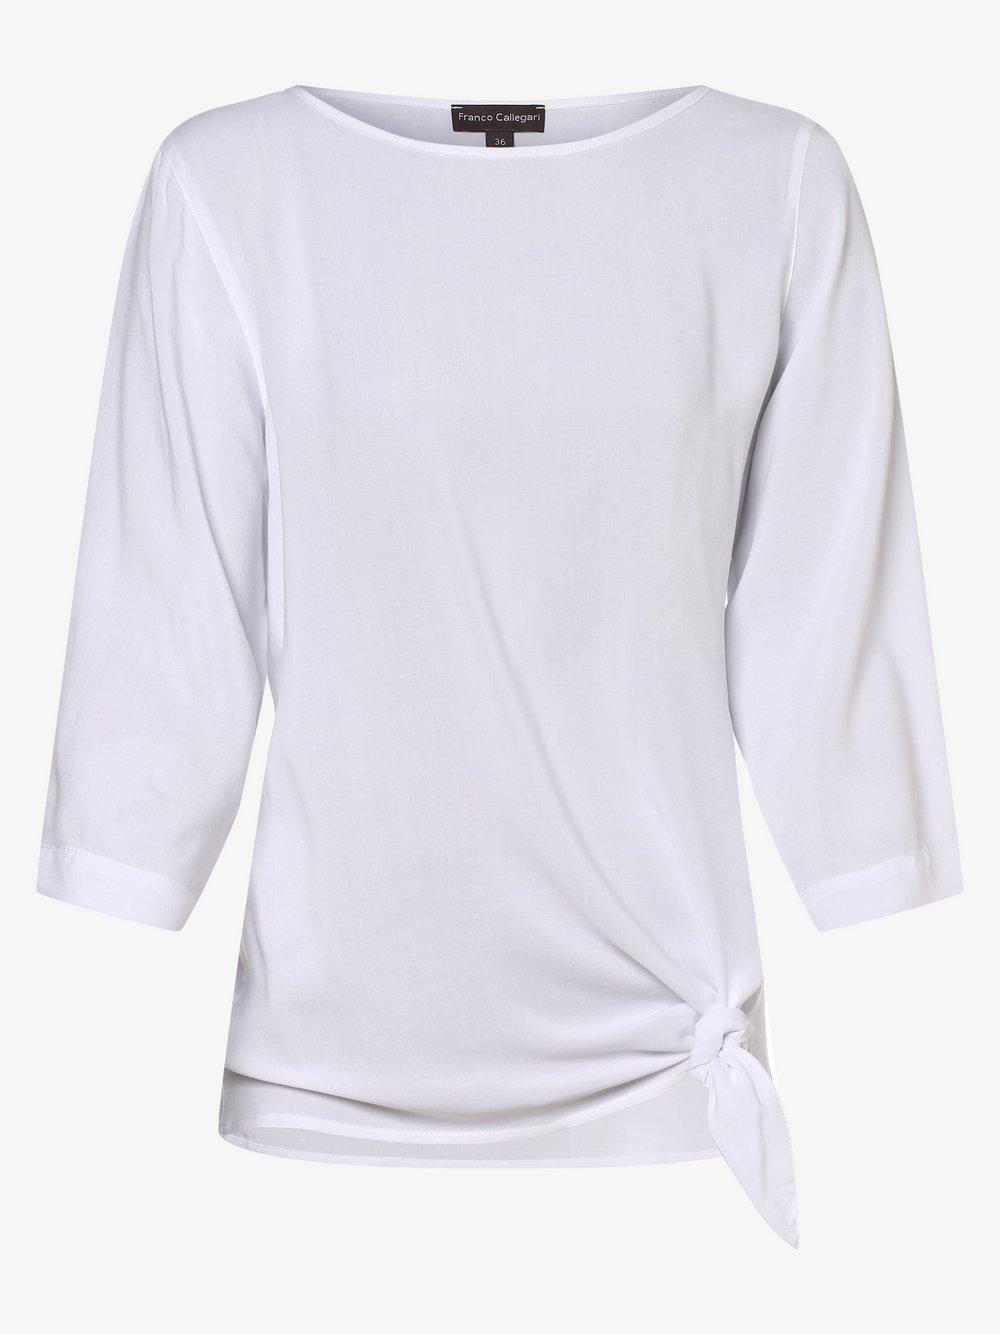 Franco Callegari – Bluzka damska, biały Van Graaf 476883-0001-00440